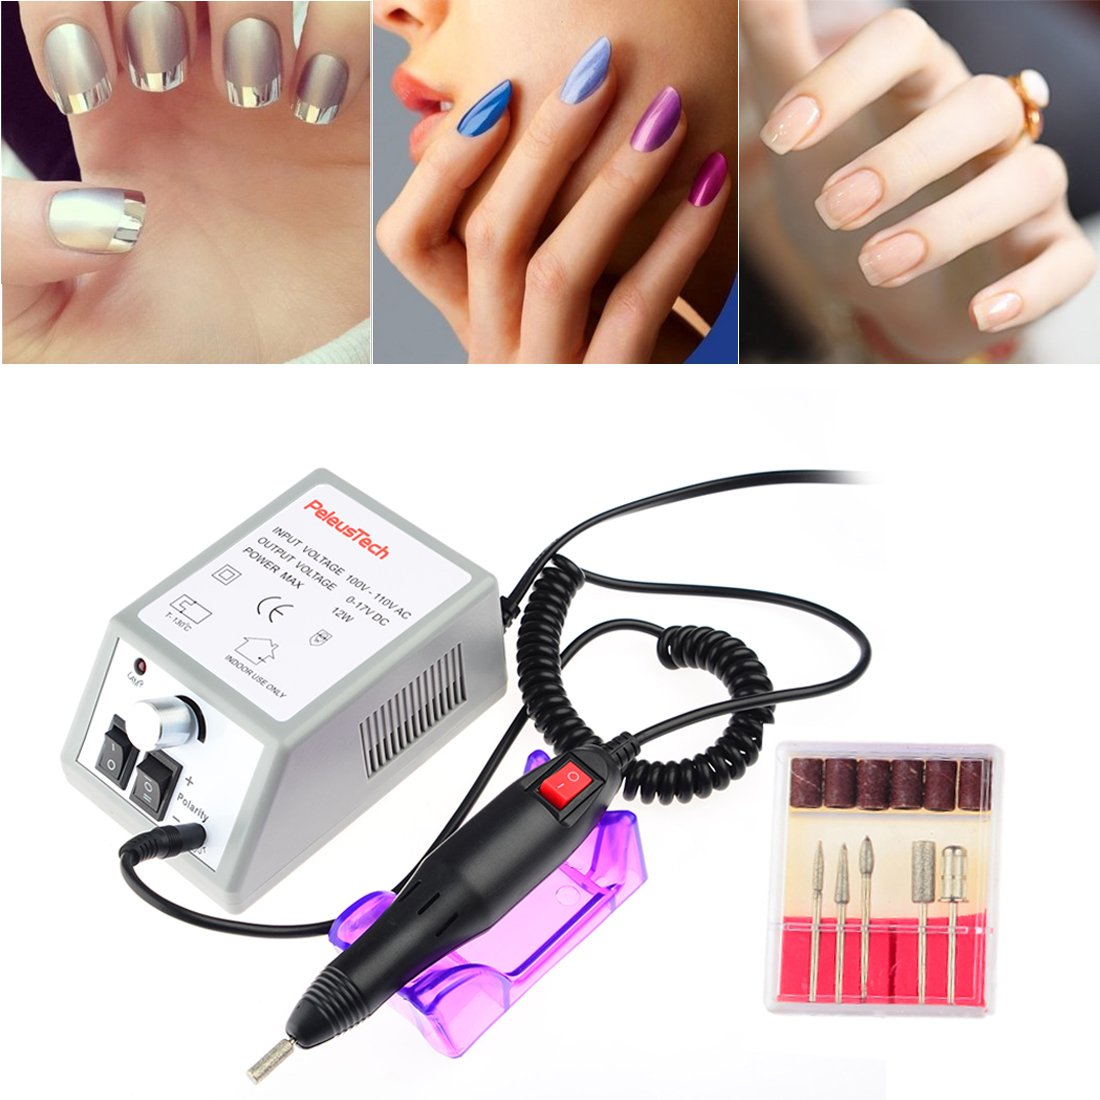 Amazon.com : Nail Drill, PeleusTech Professional Electric Nail Art ...